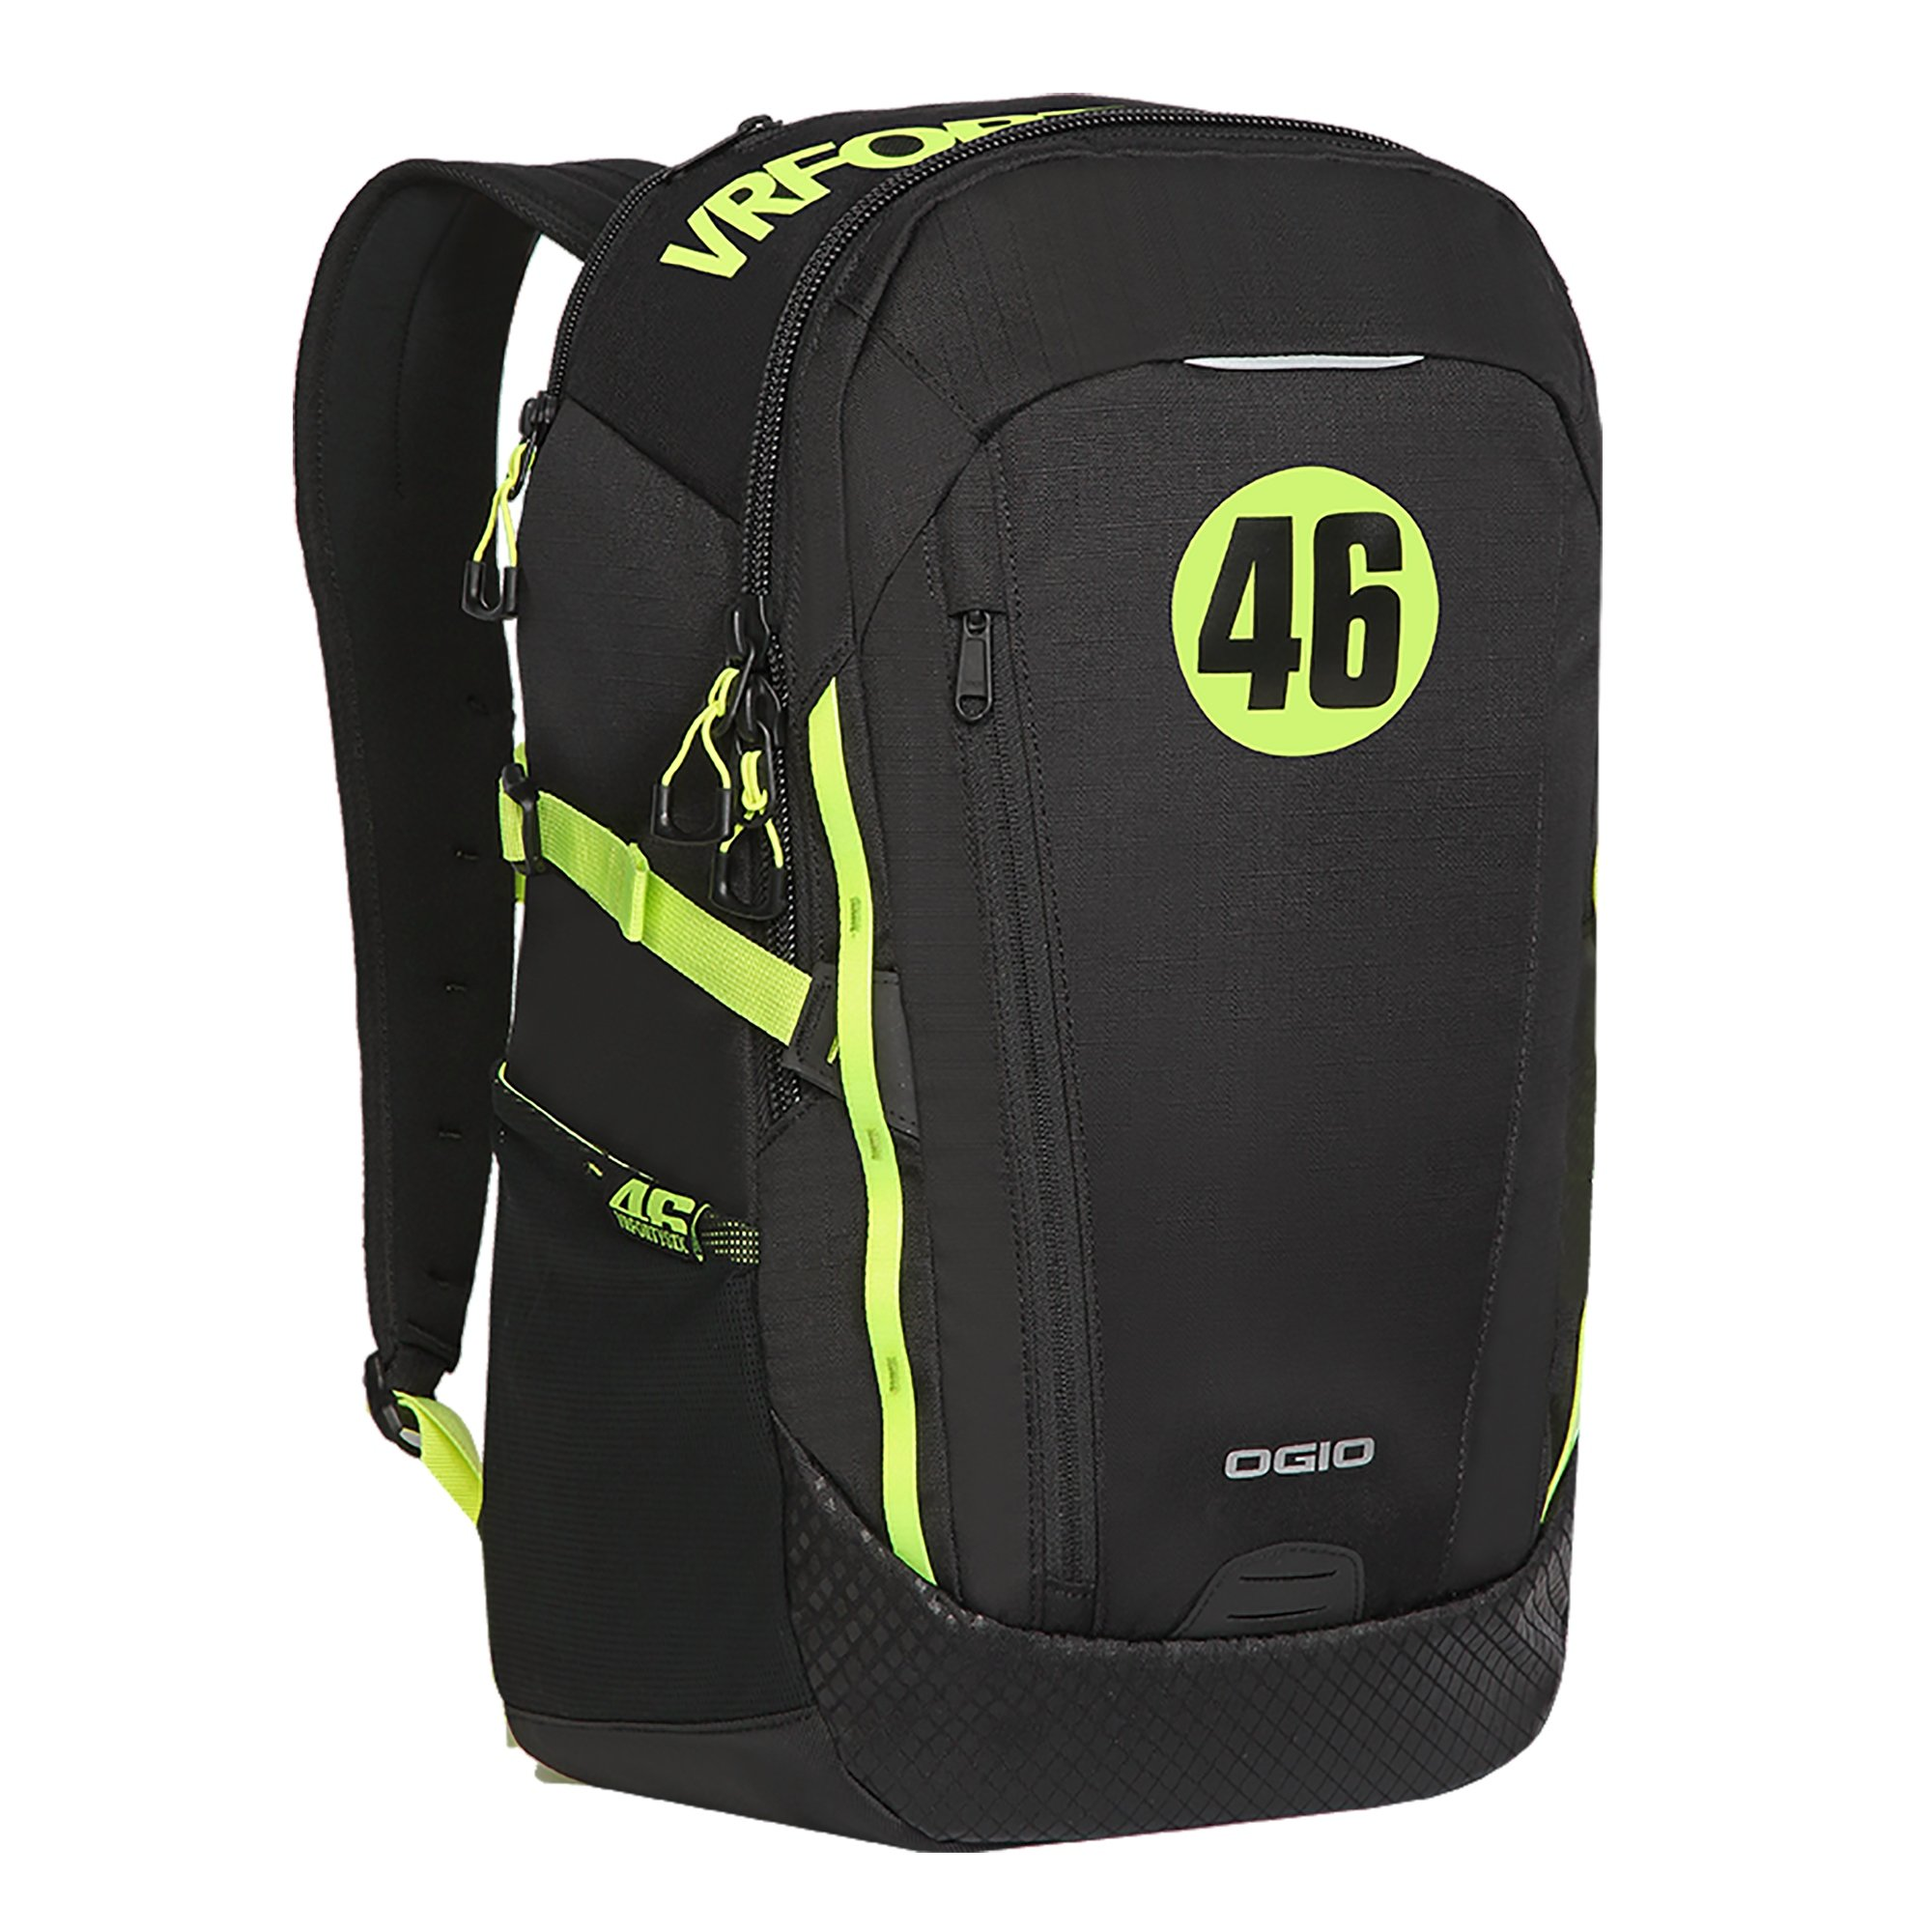 OGIO V111106_873 Black/Yellow VR46 Apollo Backpack